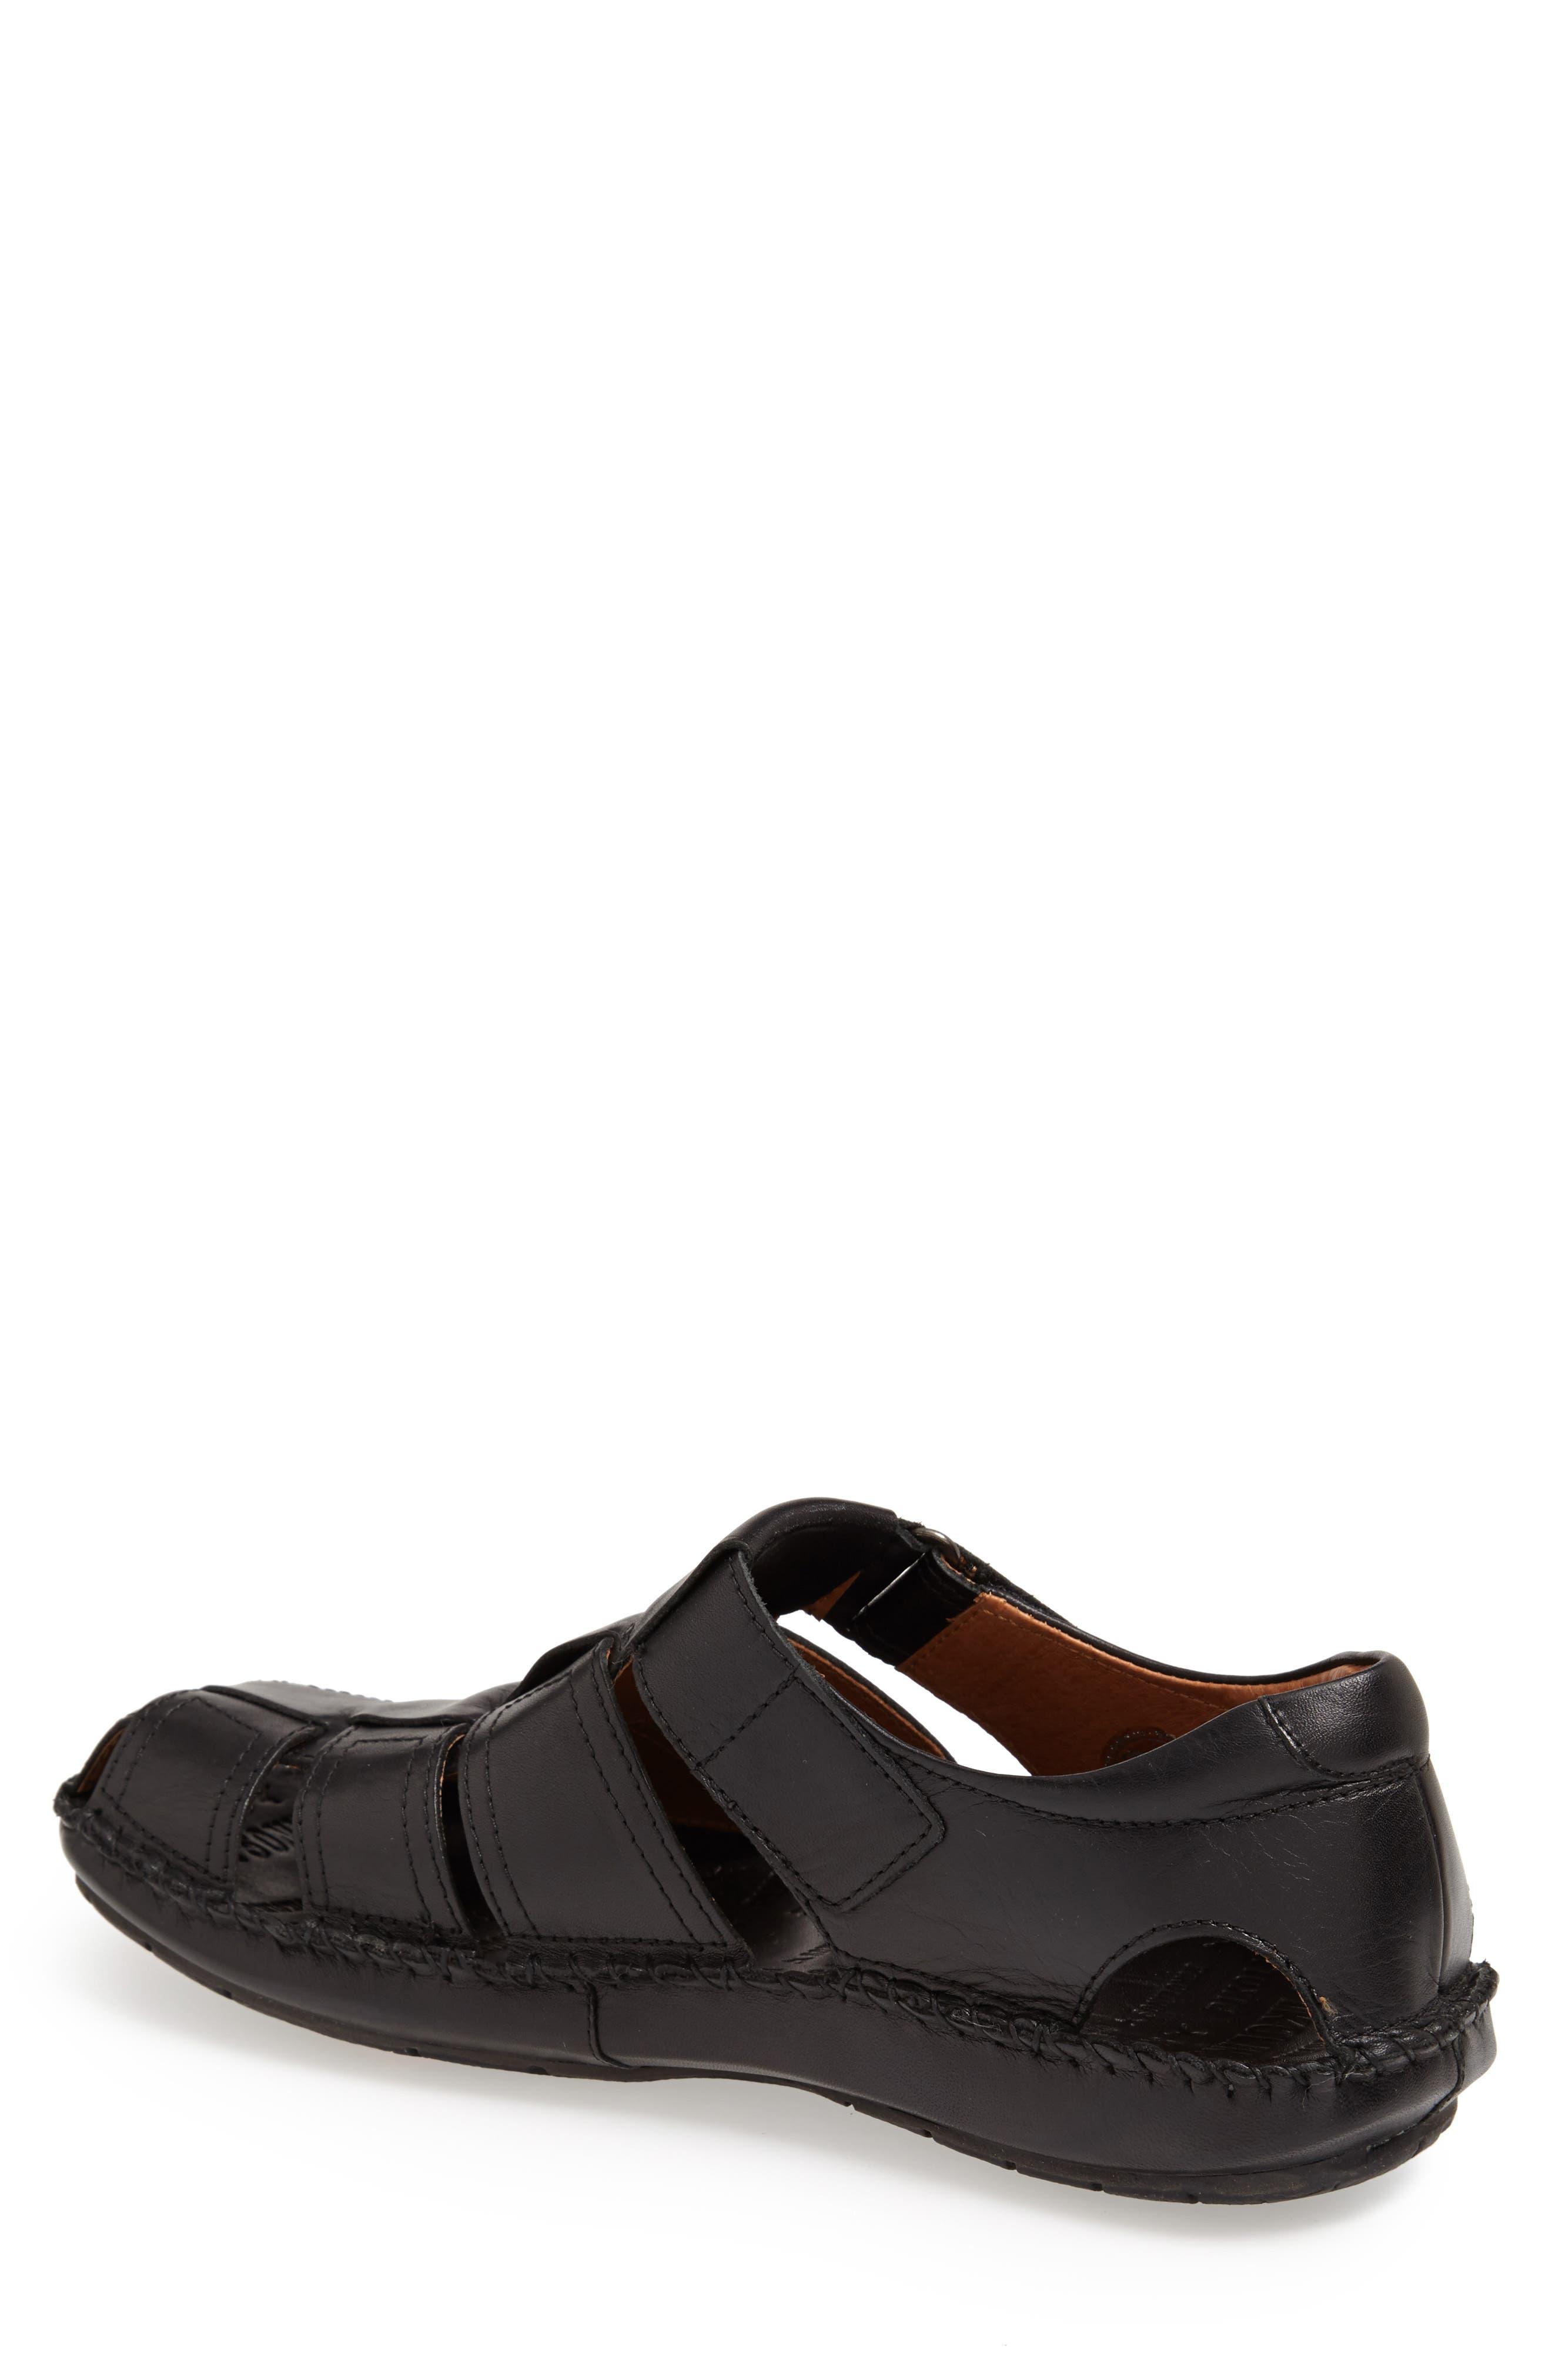 PIKOLINOS 'Tarifa' Sandal, Main, color, BLACK